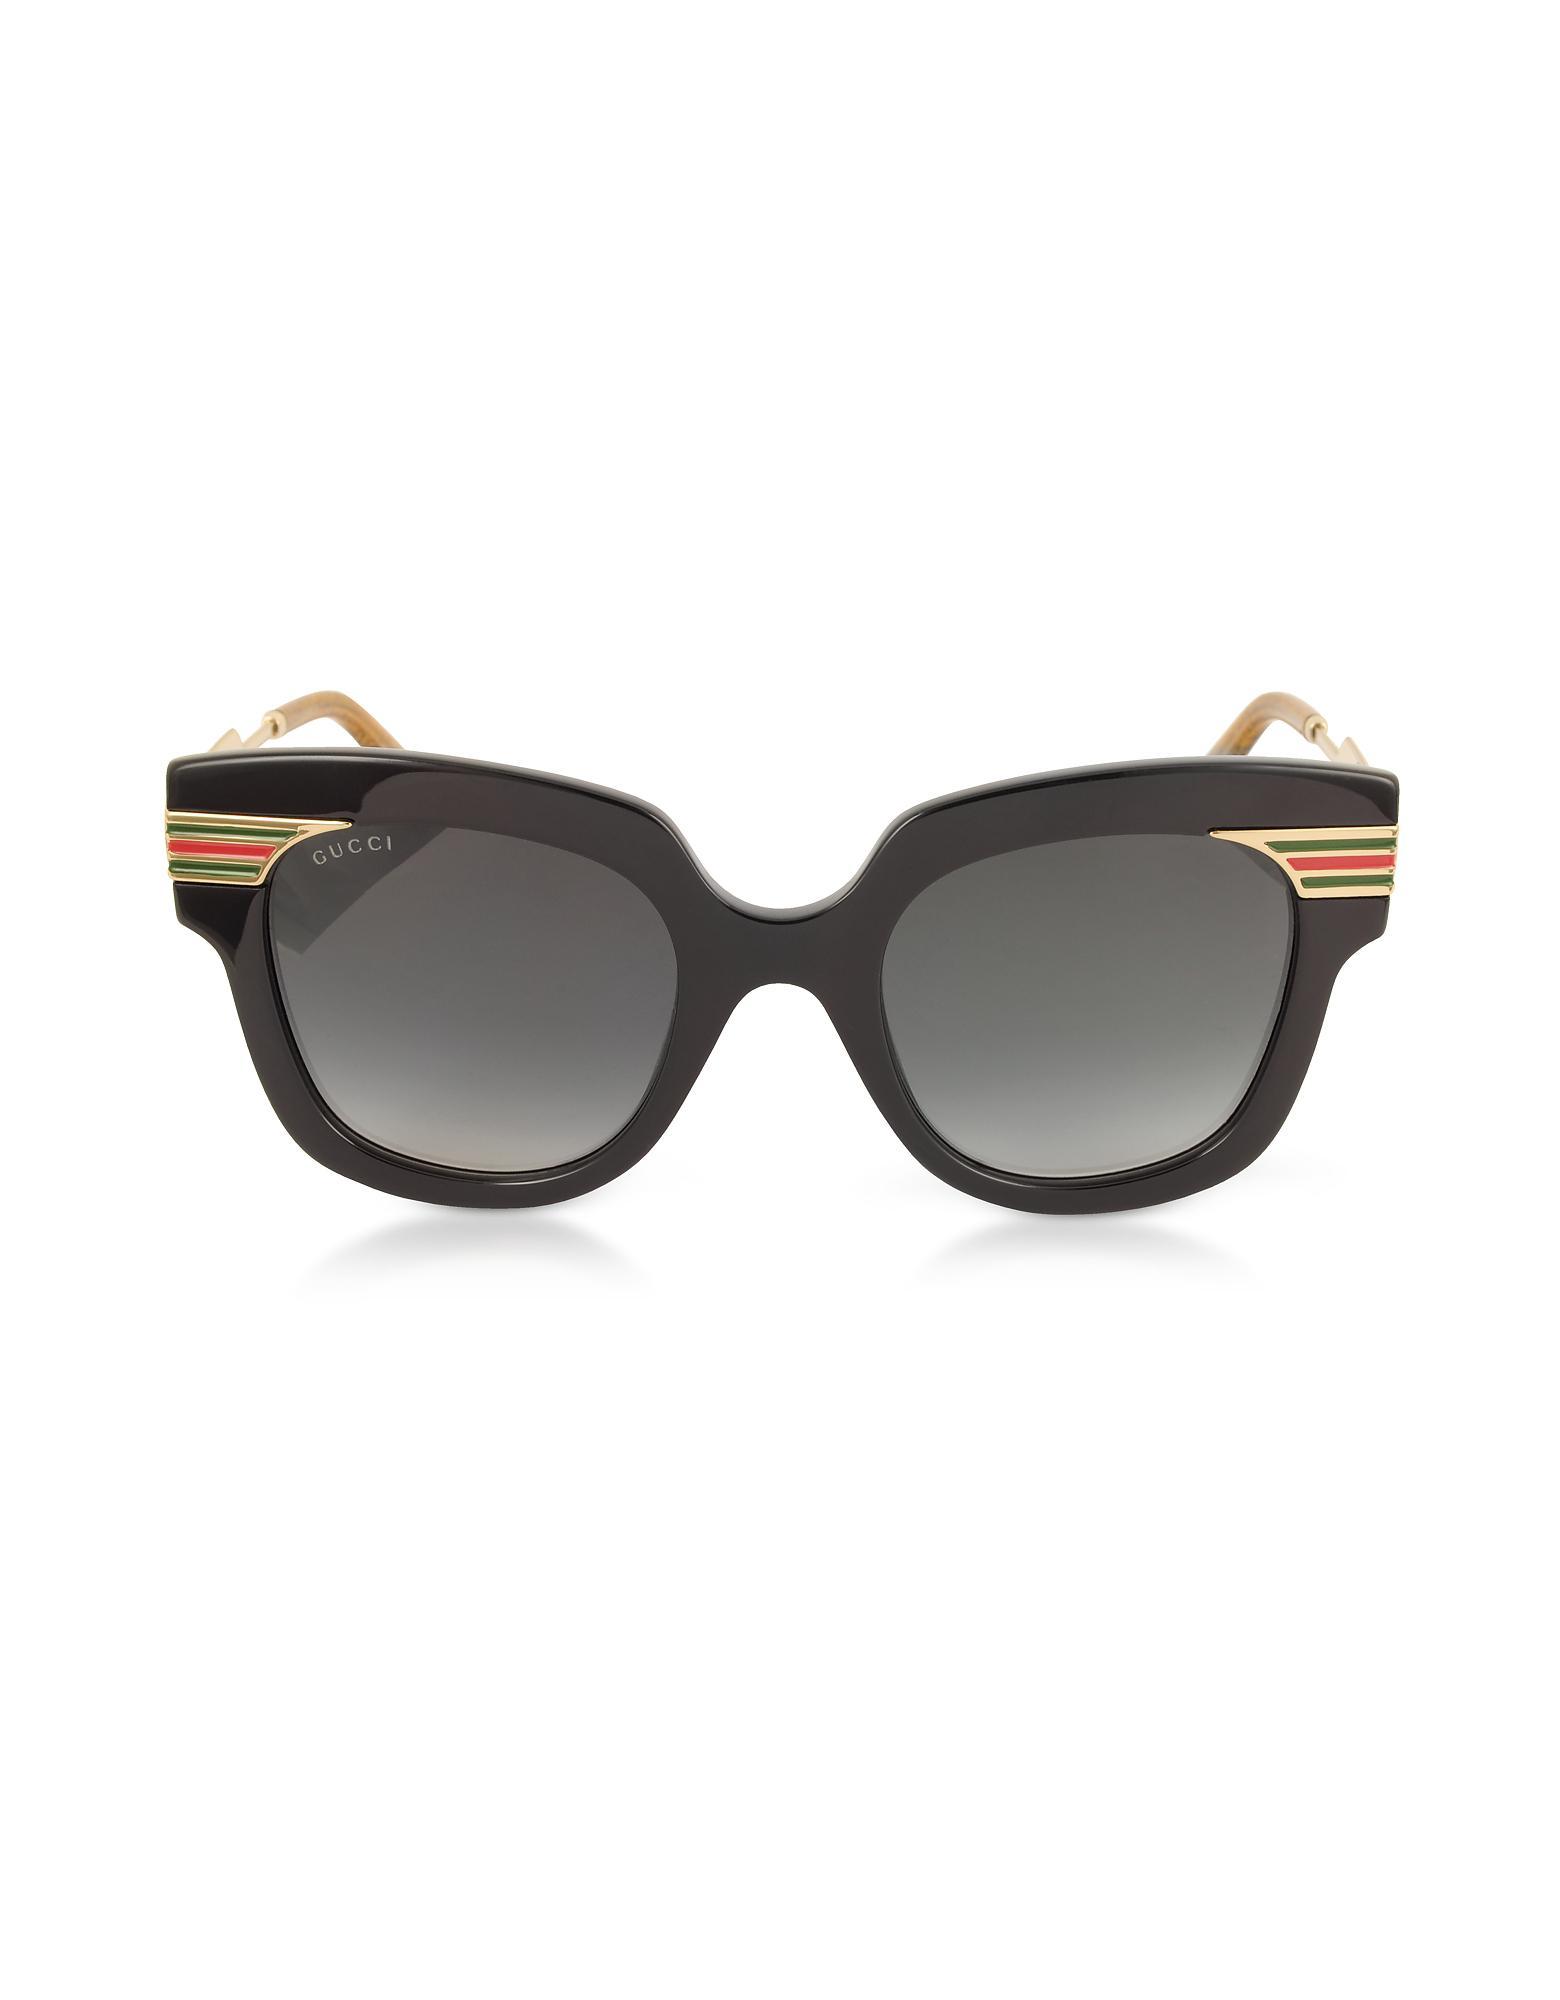 4d1c84f6fb Gucci Gg0281s Square-frame Black Acetate Sunglasses W sylvie Web ...